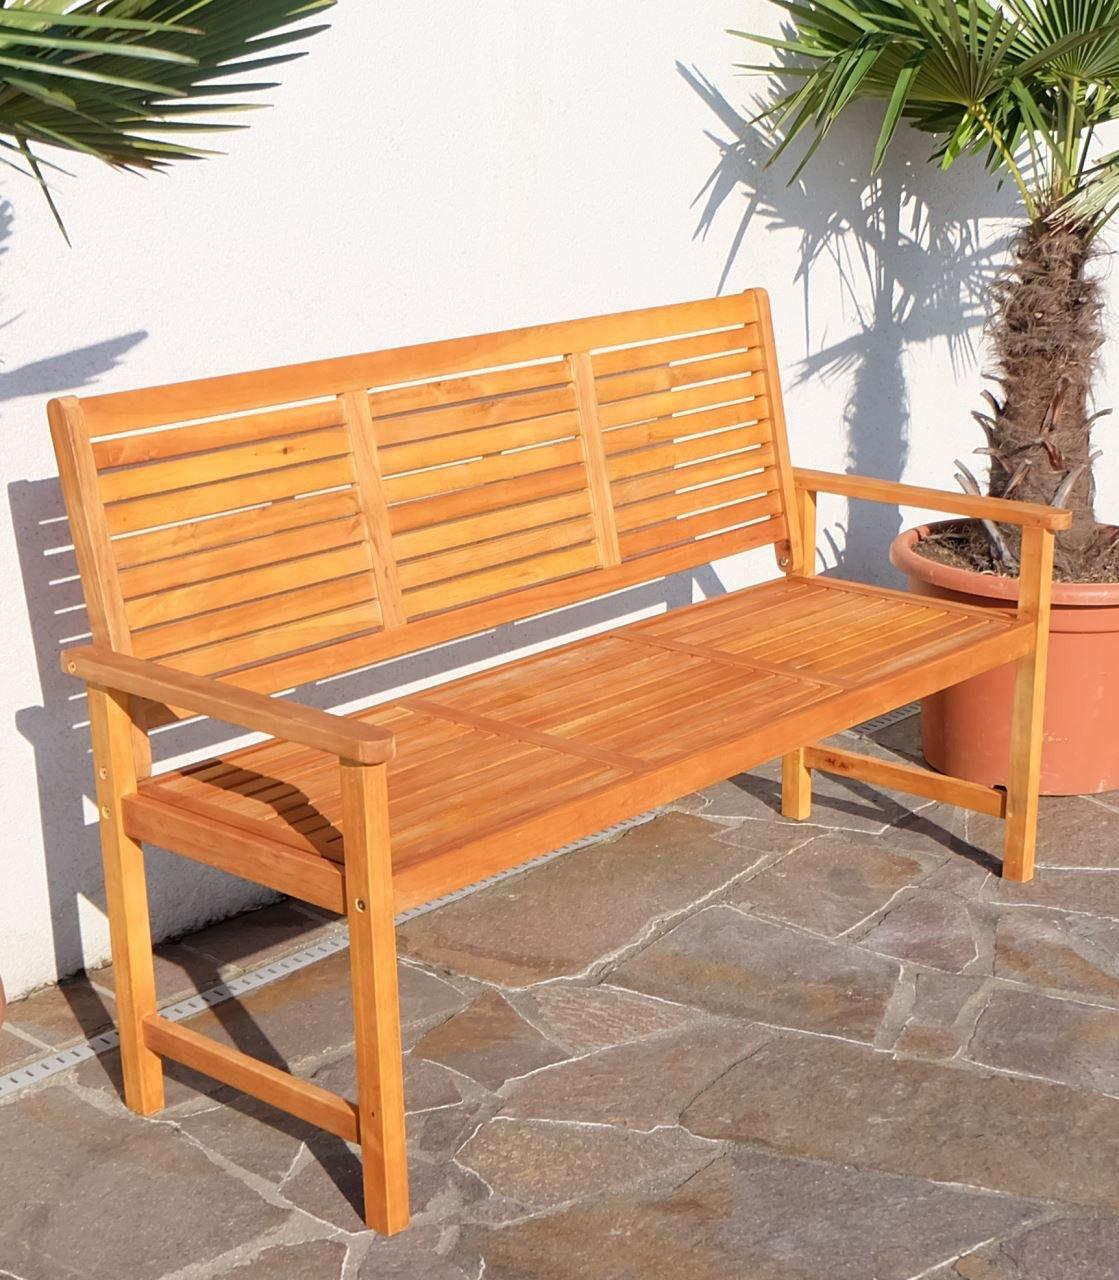 Design Gartenbank Parkbank Sitzbank 3 Sitzer Bank Gartenmöbel Holz  Eukalyptus W.Teak Modell: